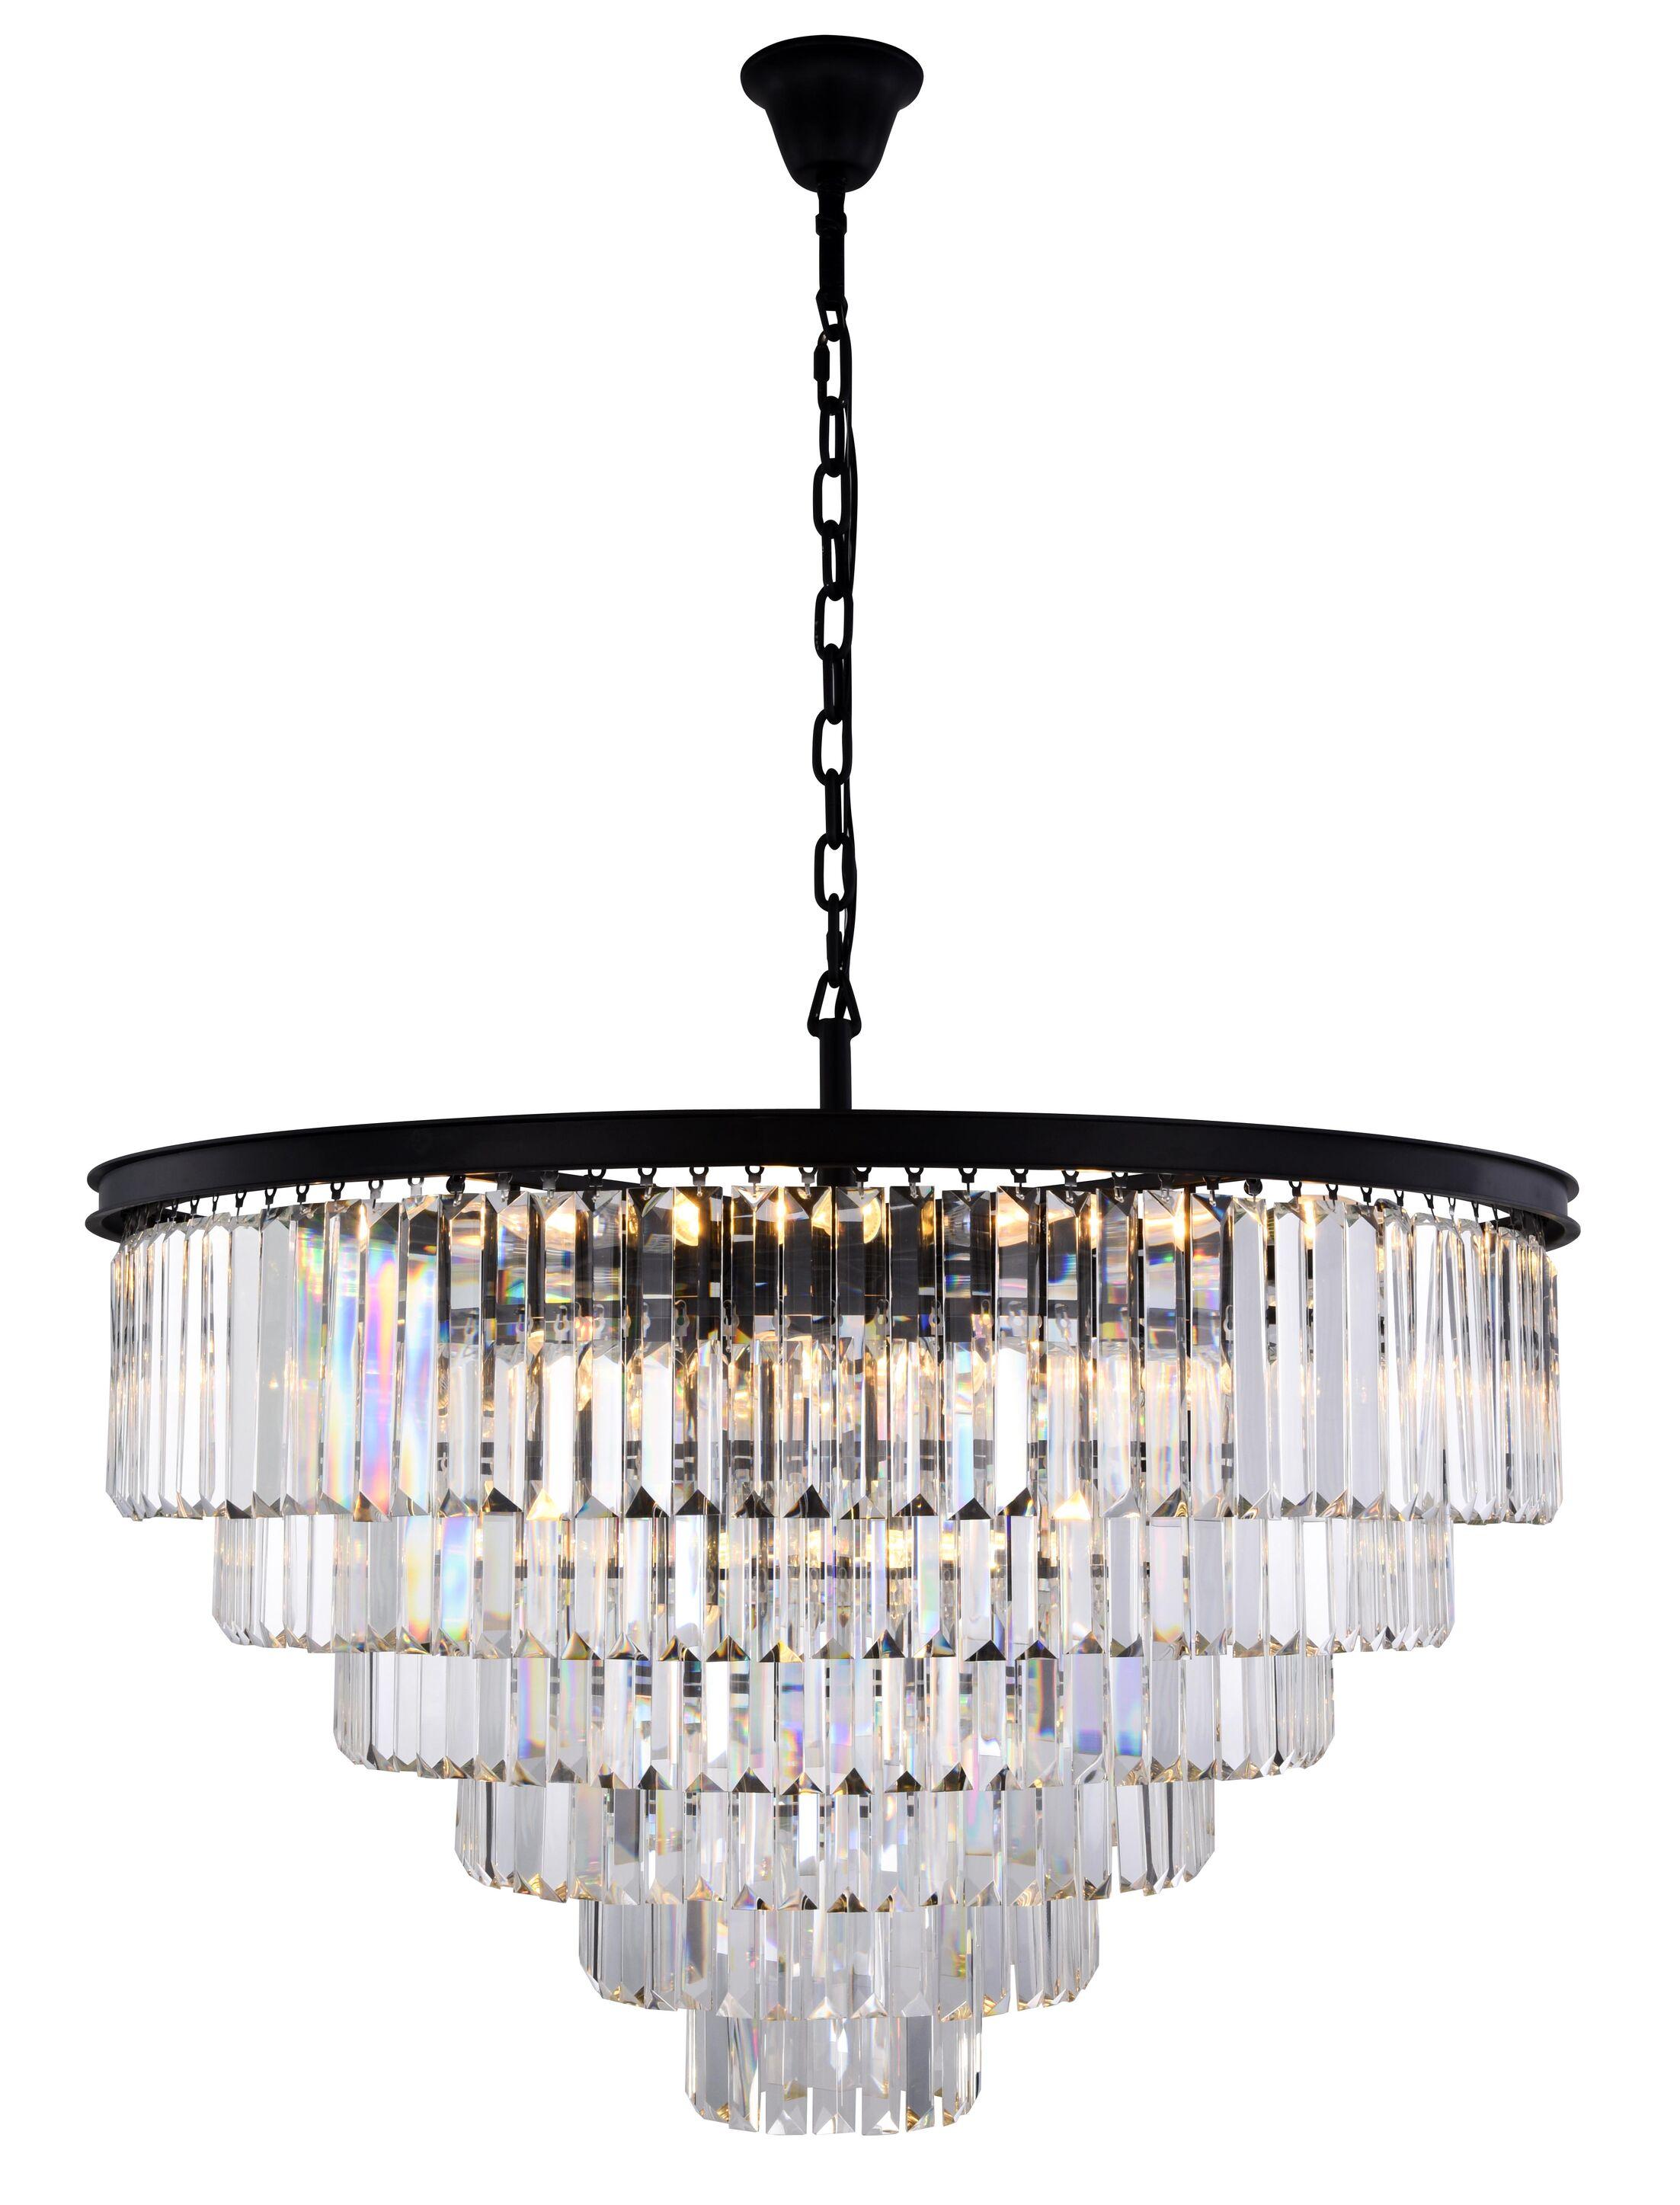 Lavinia 33-Light Chandelier Crystal Color: Clear, Finish: Matte Black